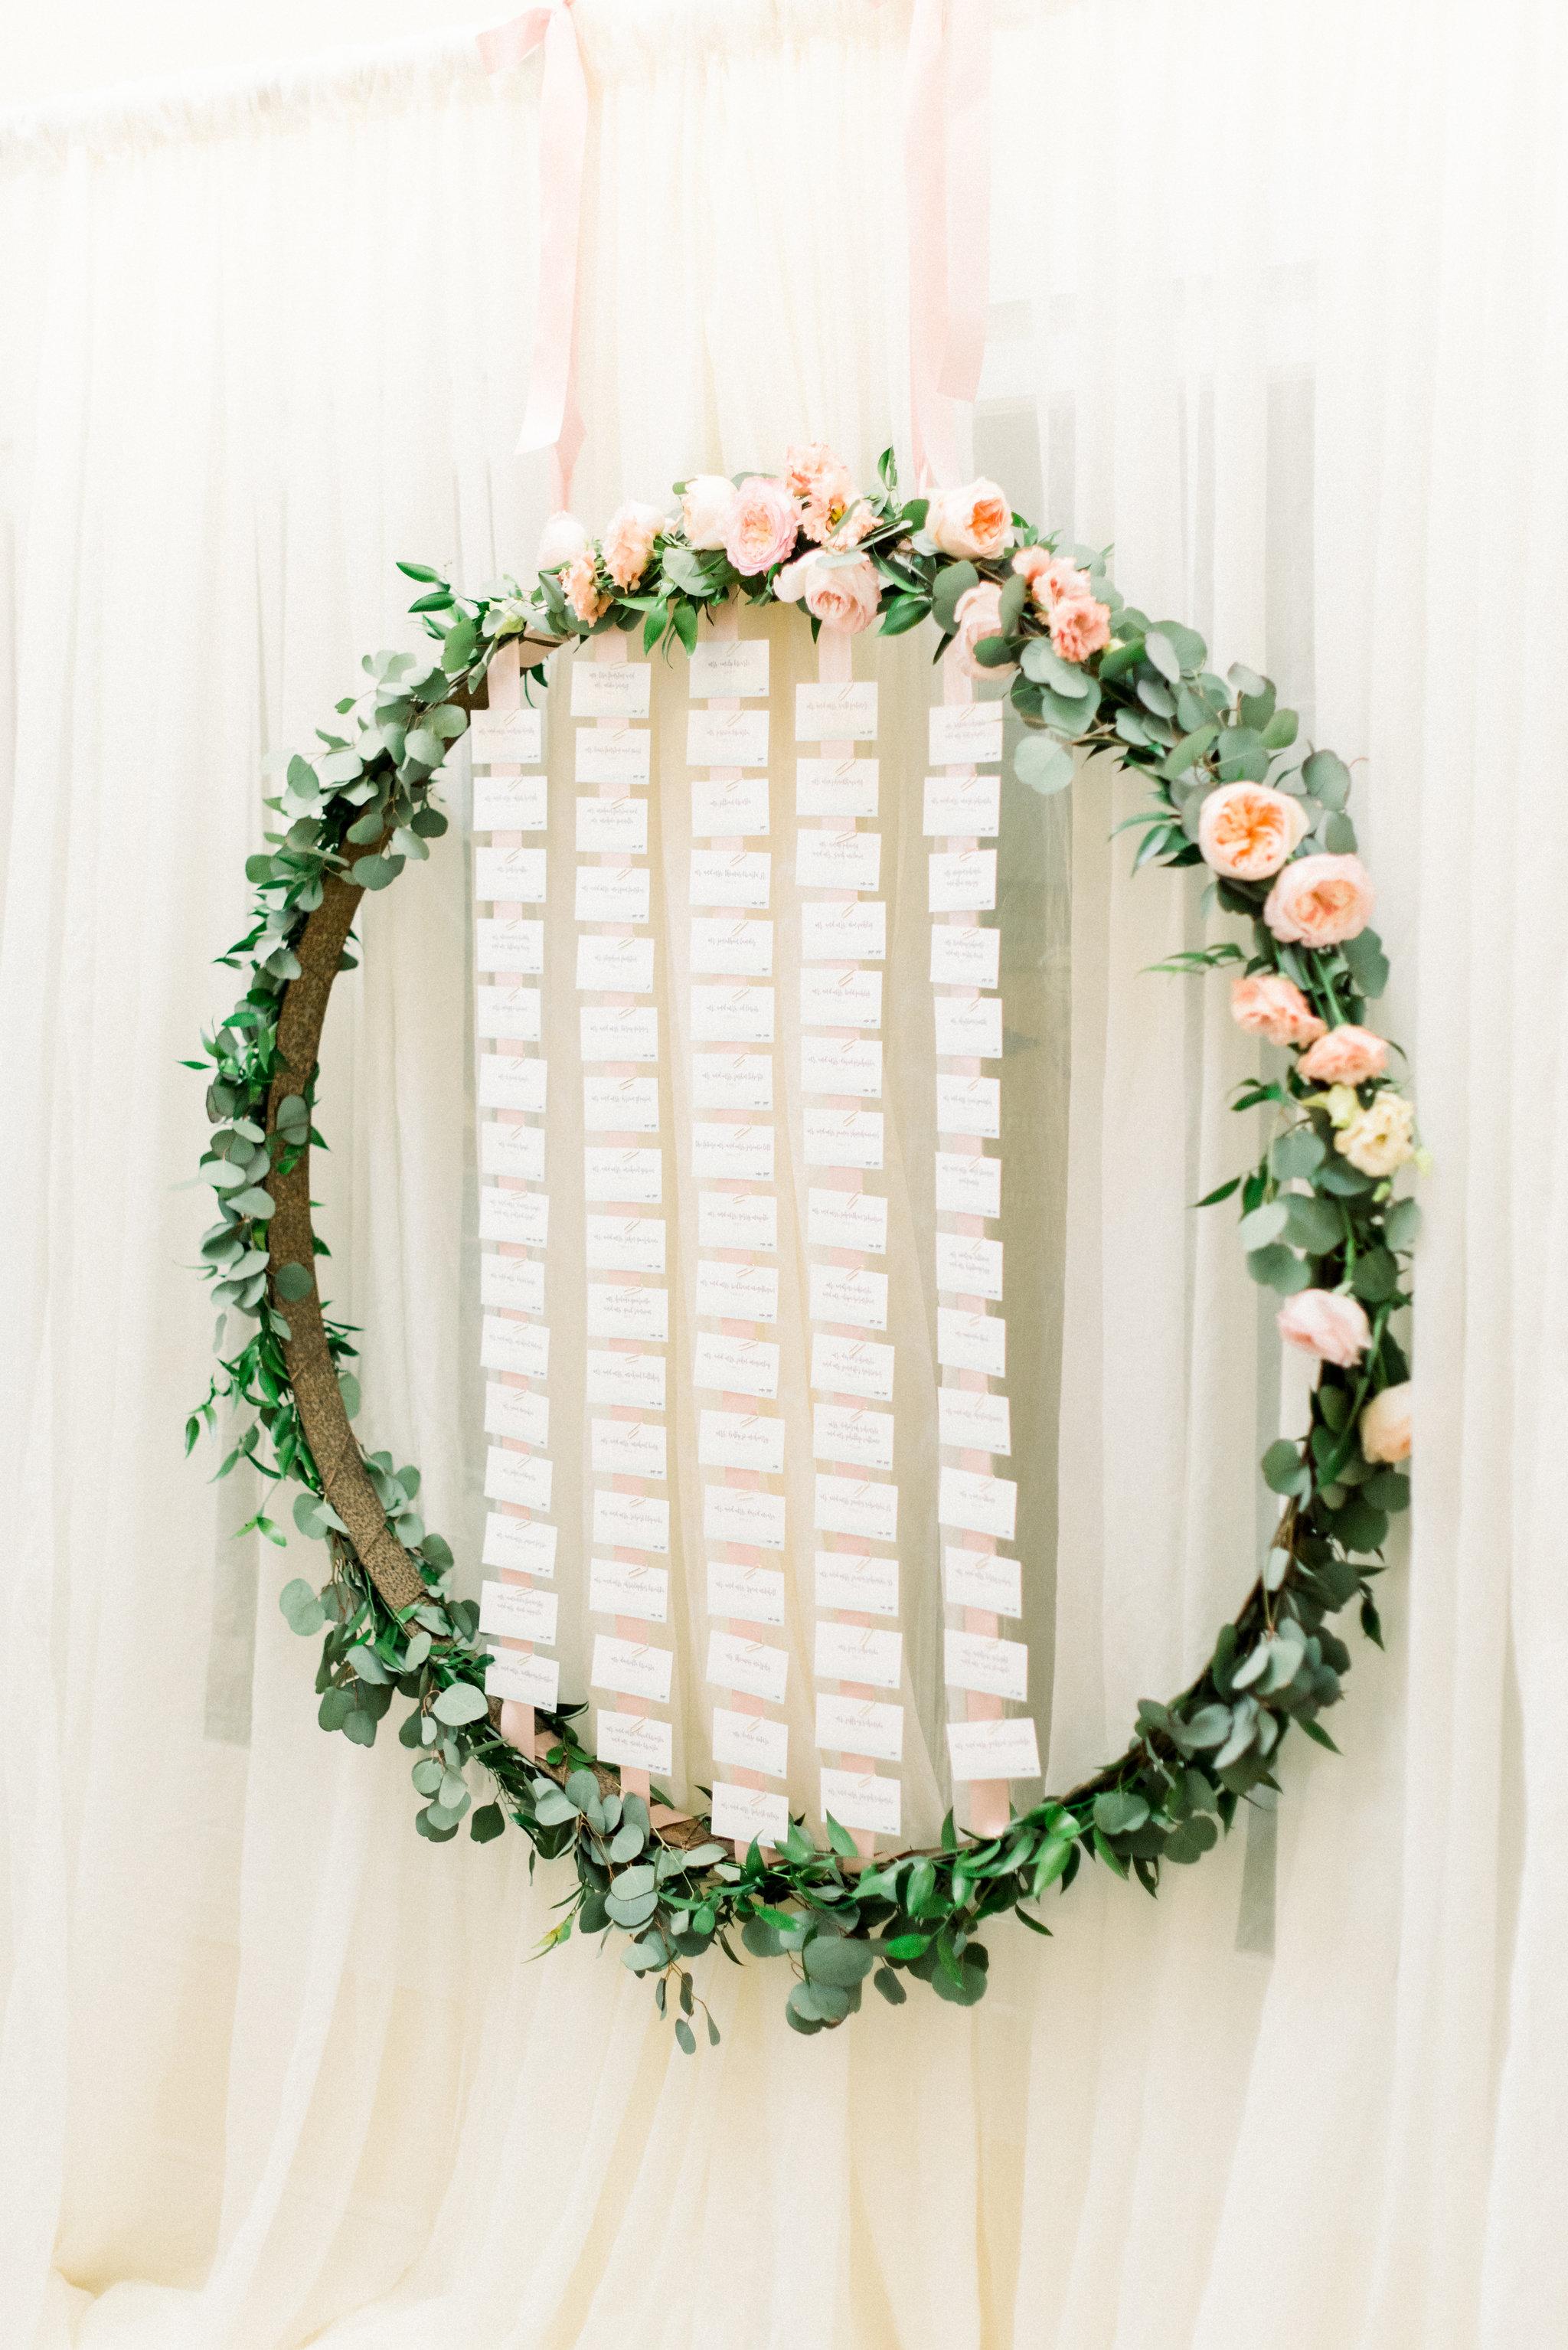 Avalon Wedding, Escort Cards, Seating Assignment, Beach Wedding, Greenery Wedding, Blush Wedding